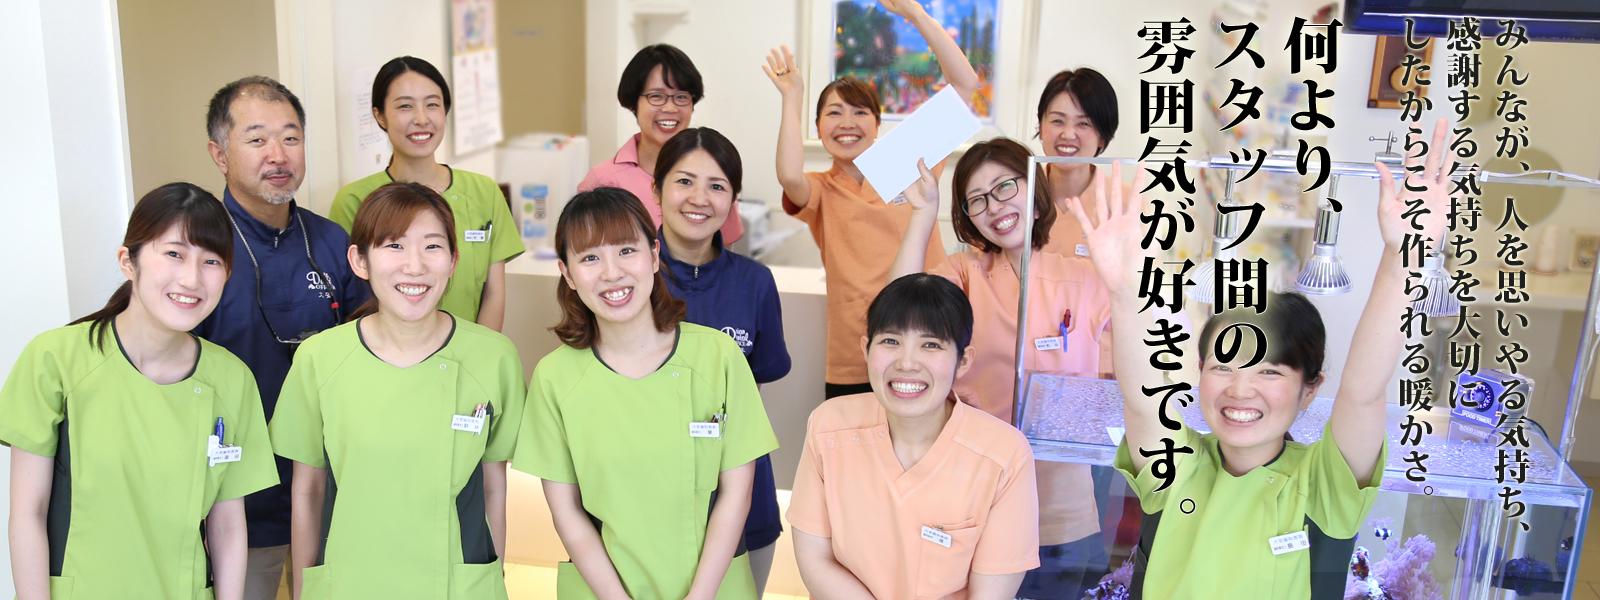 大安歯科医院 採用特設サイト